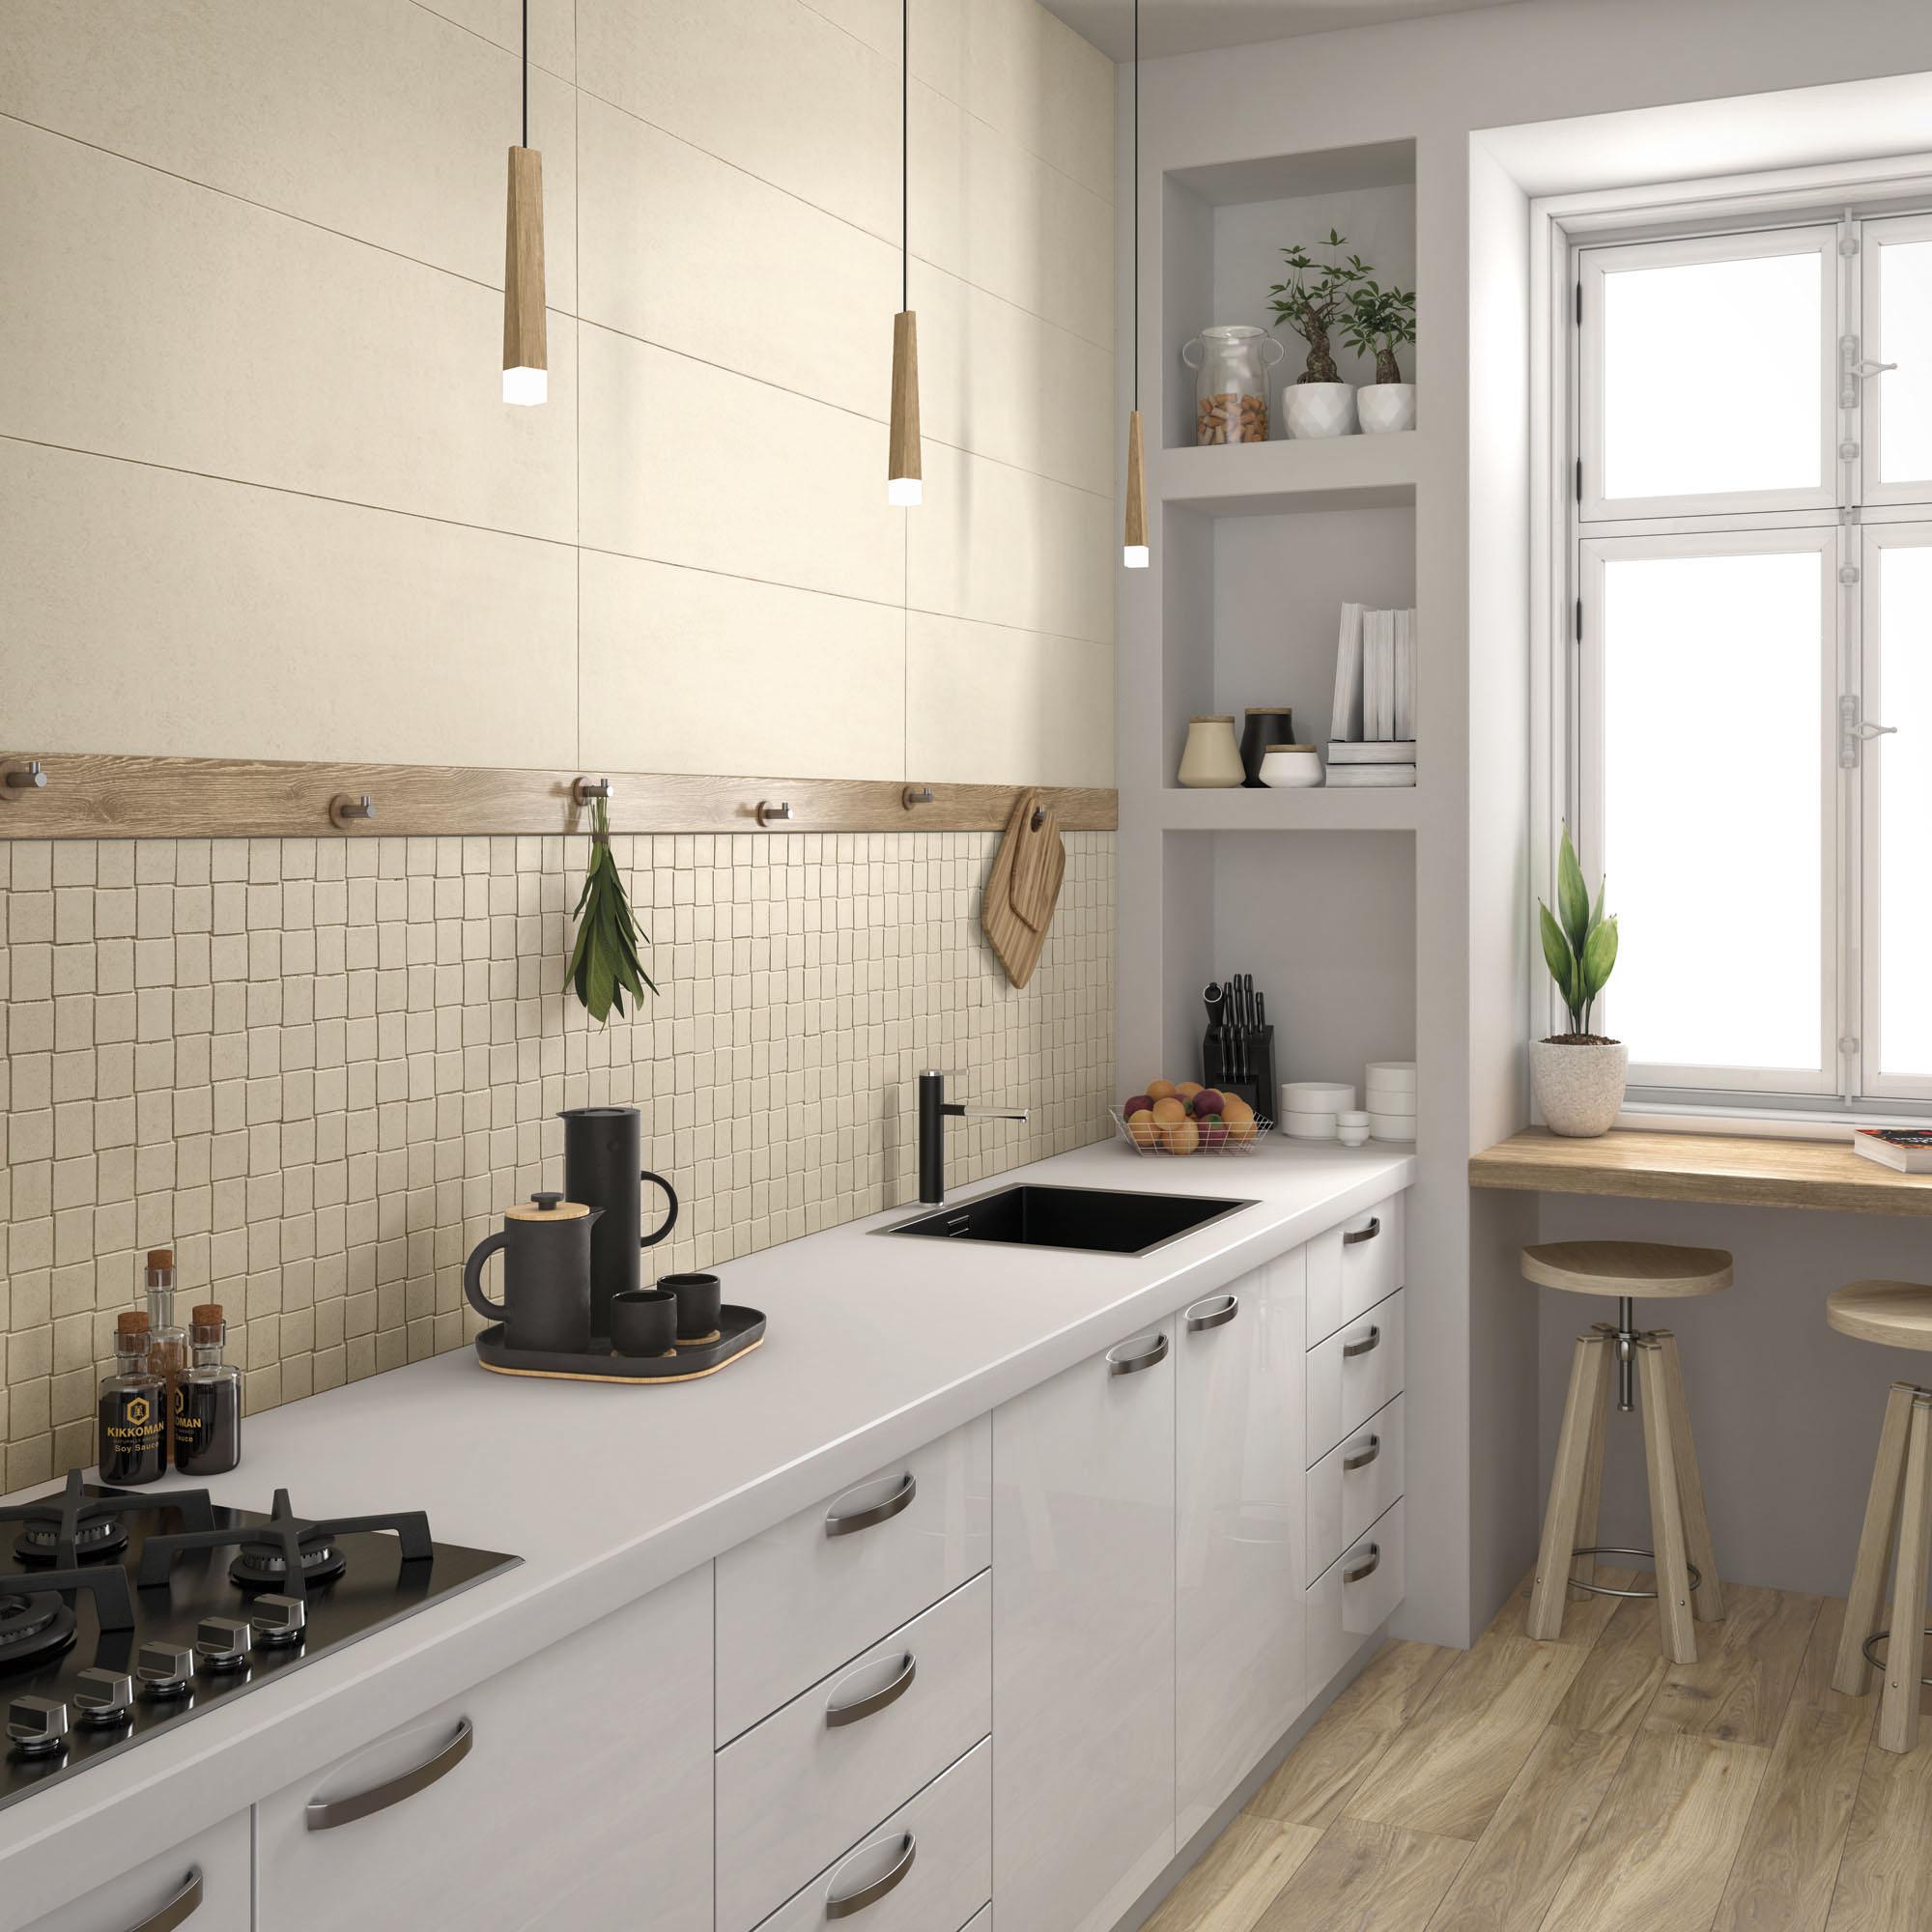 Sandstone Ivory_Cozinha amb